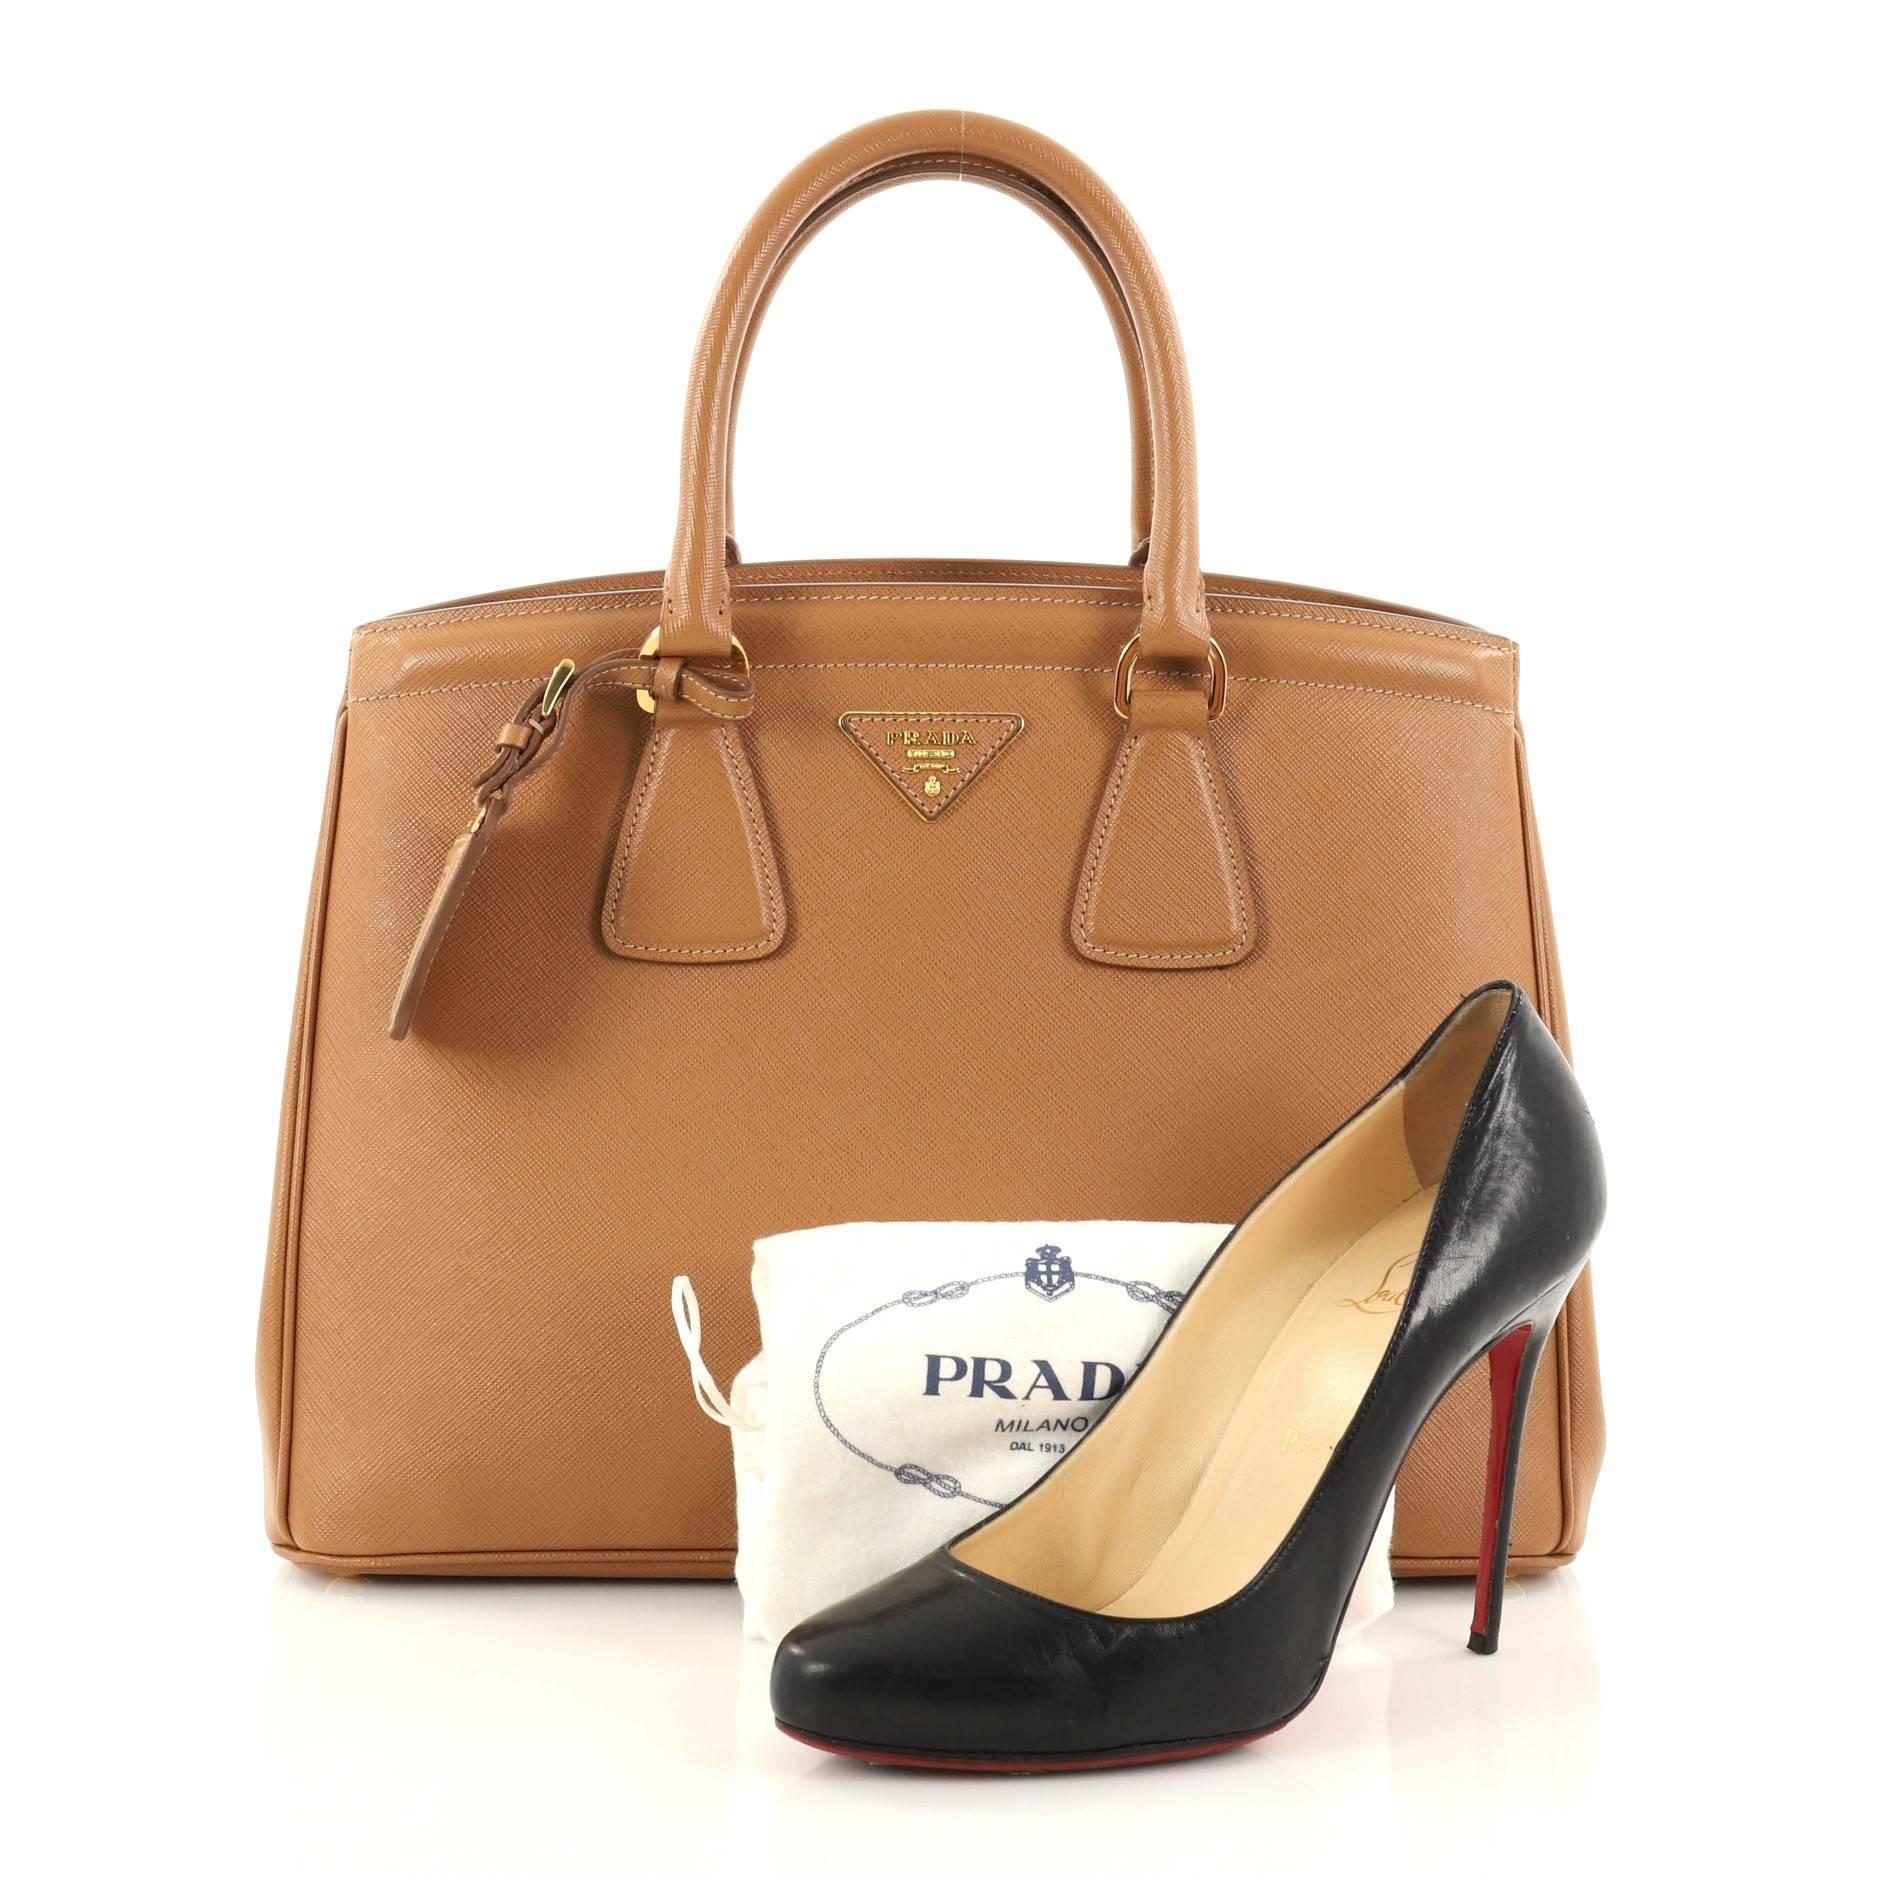 Prada Saffiano leather medium tote dkNTi1mf3